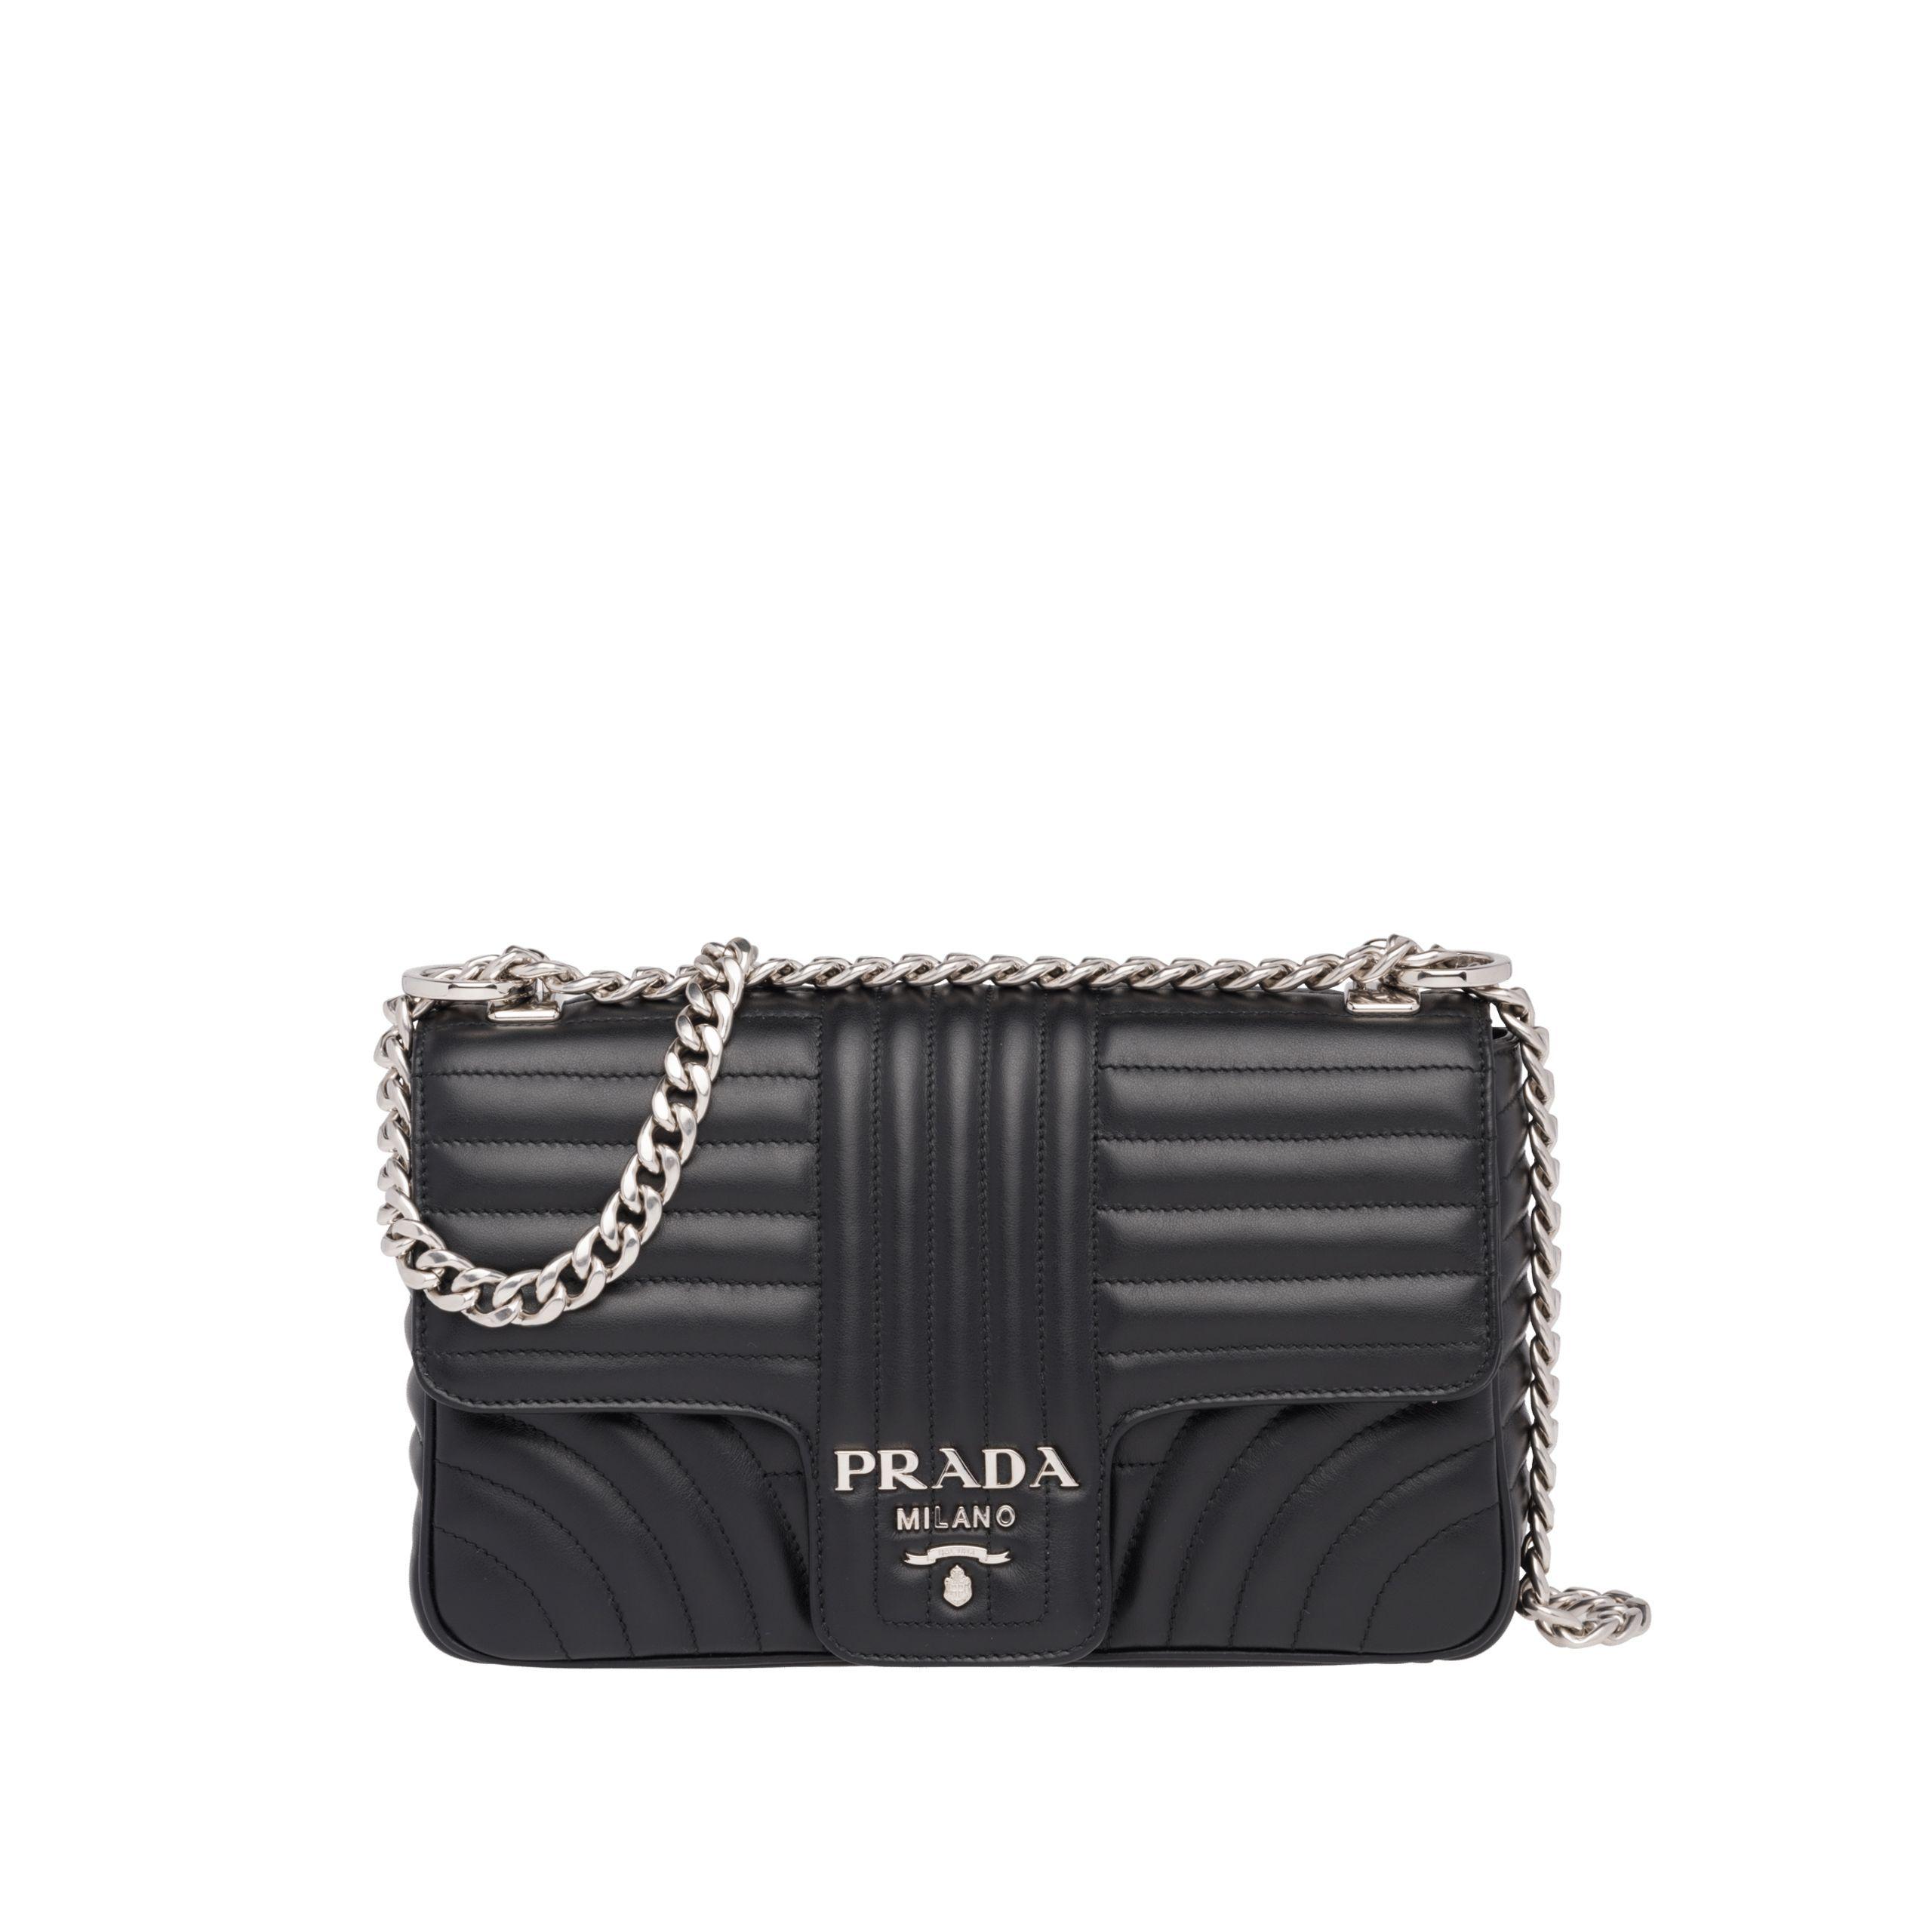 bdac6890f4a6 Prada Diagramme leather shoulder bag | maman in 2019 | Black leather ...